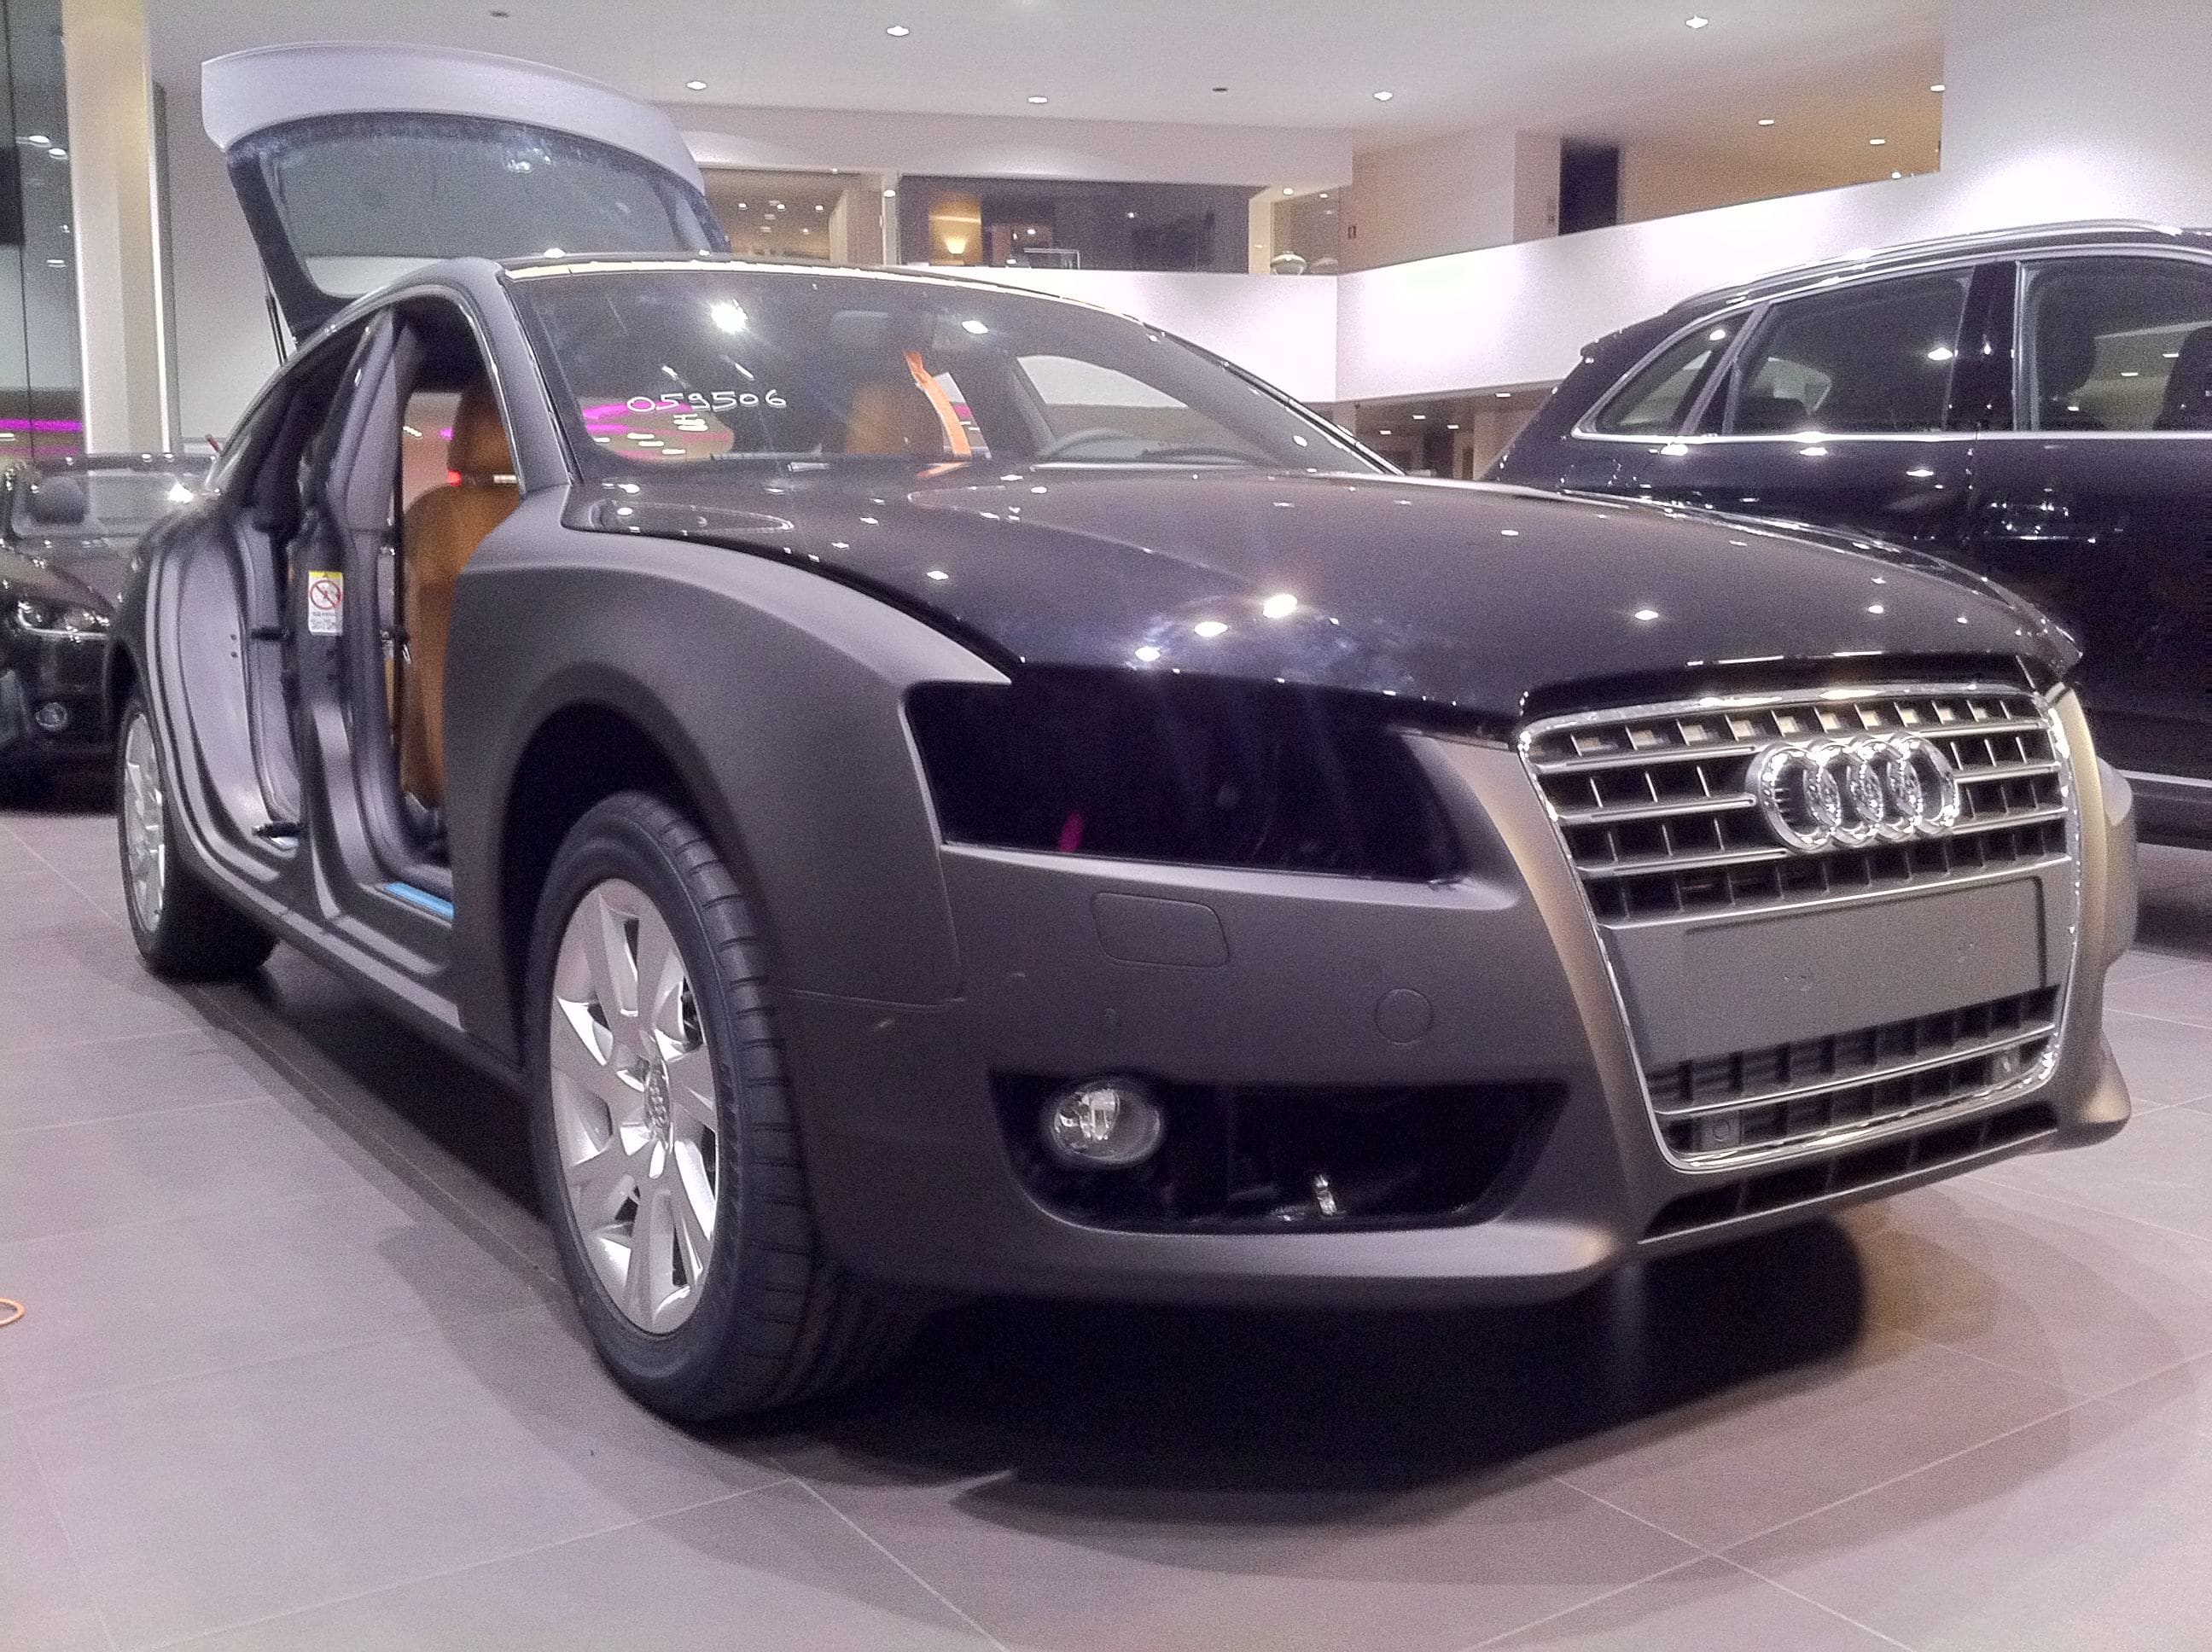 Audi A5 Sportback met Mat Grijze Wrap, Carwrapping door Wrapmyride.nu Foto-nr:4774, ©2021